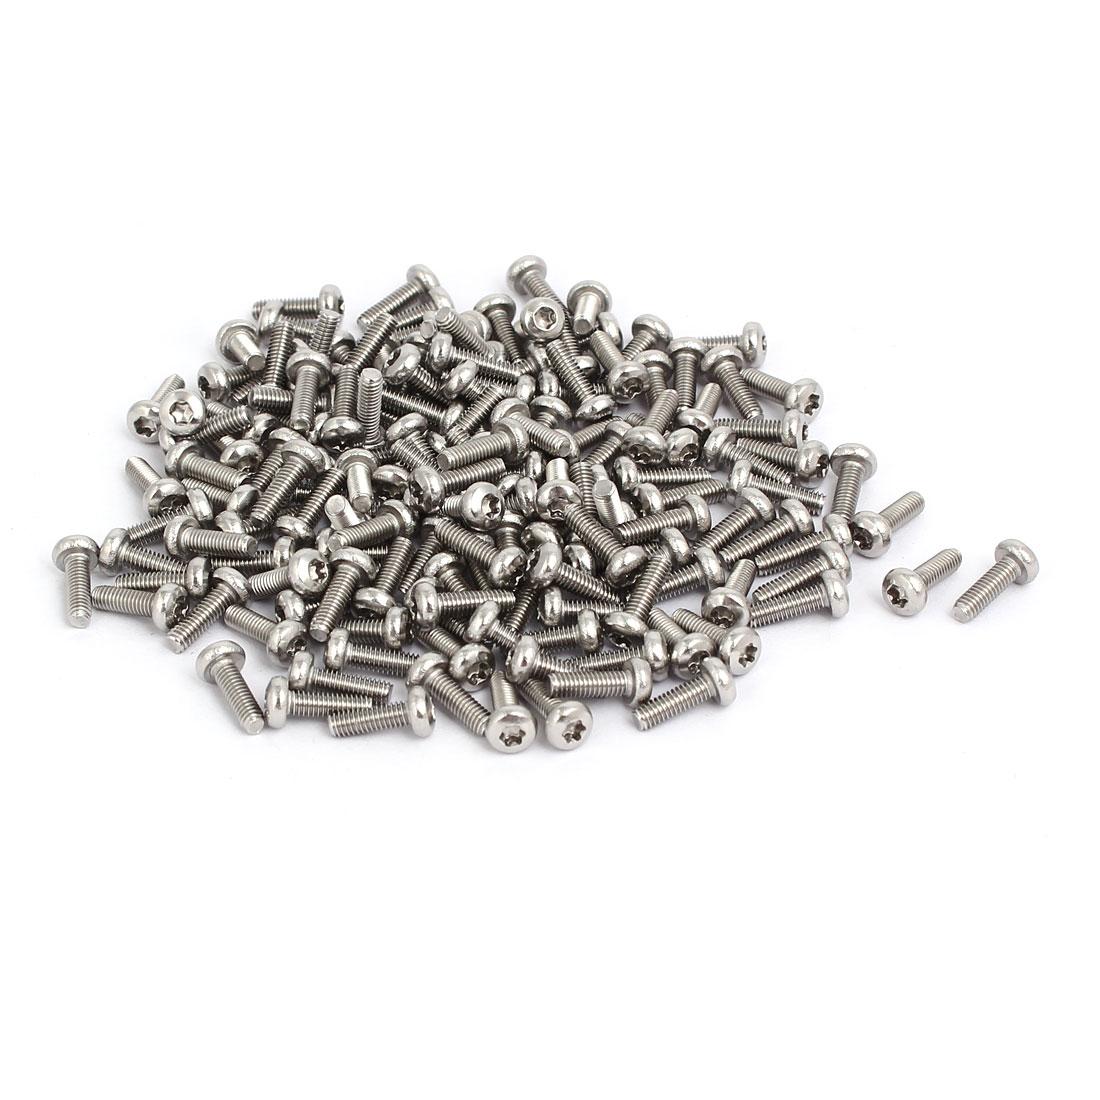 M2.5x8mm 304 Stainless Steel Button Head Torx Screws Fasteners 200pcs